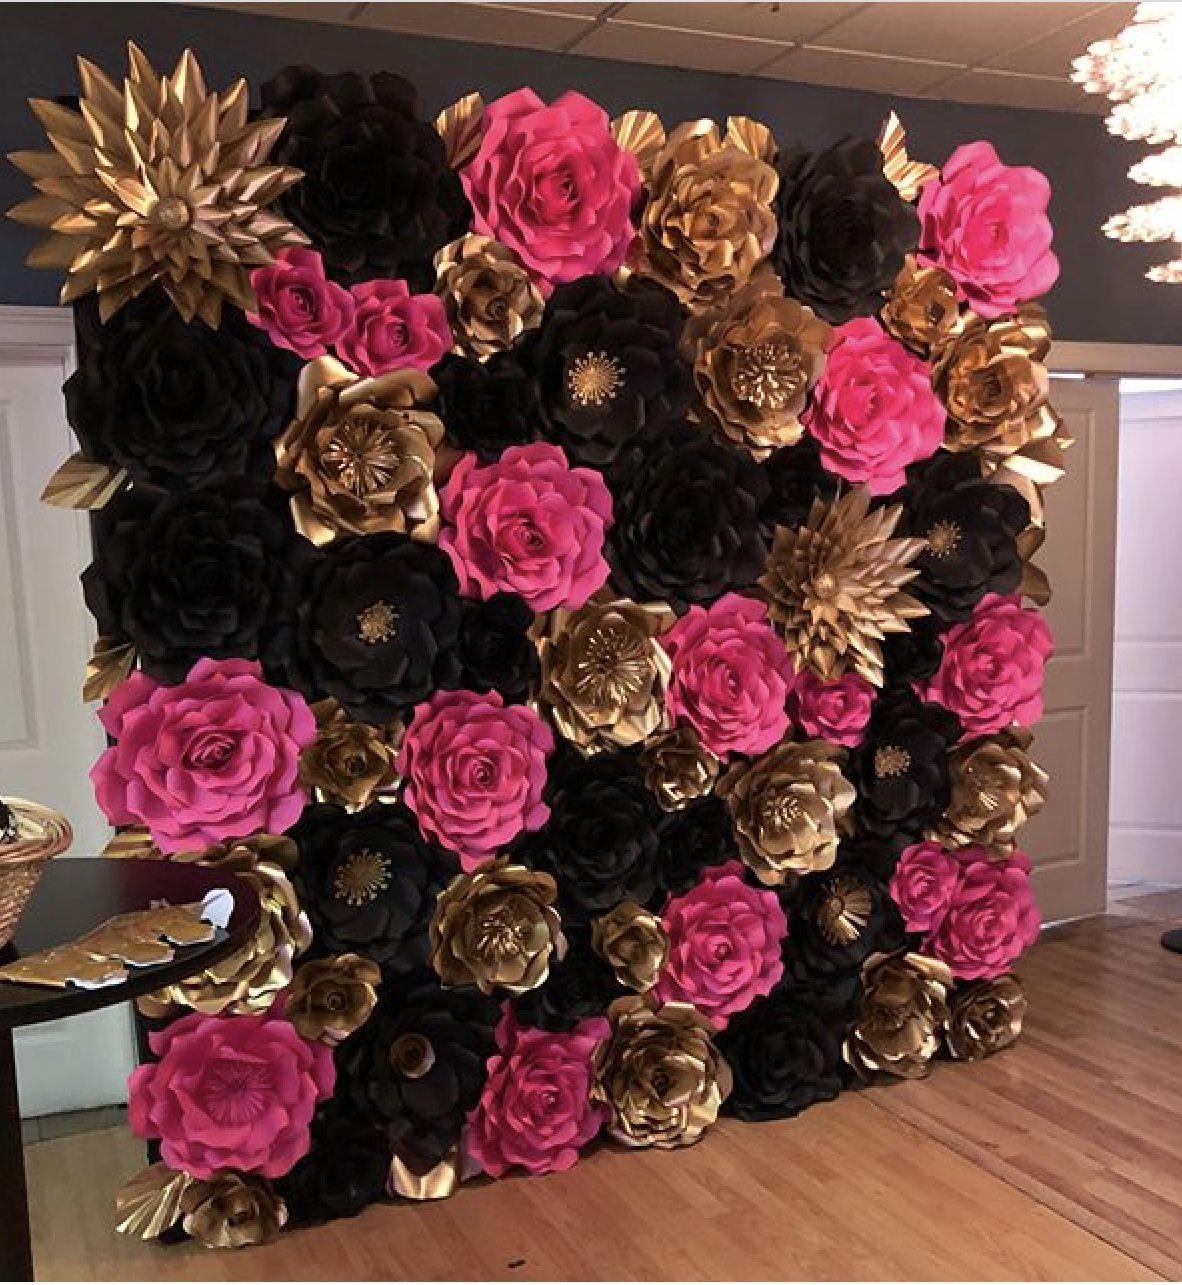 Paperflower Backdrop Paper Flower Backdrop Paper Flowers Flower Backdrop